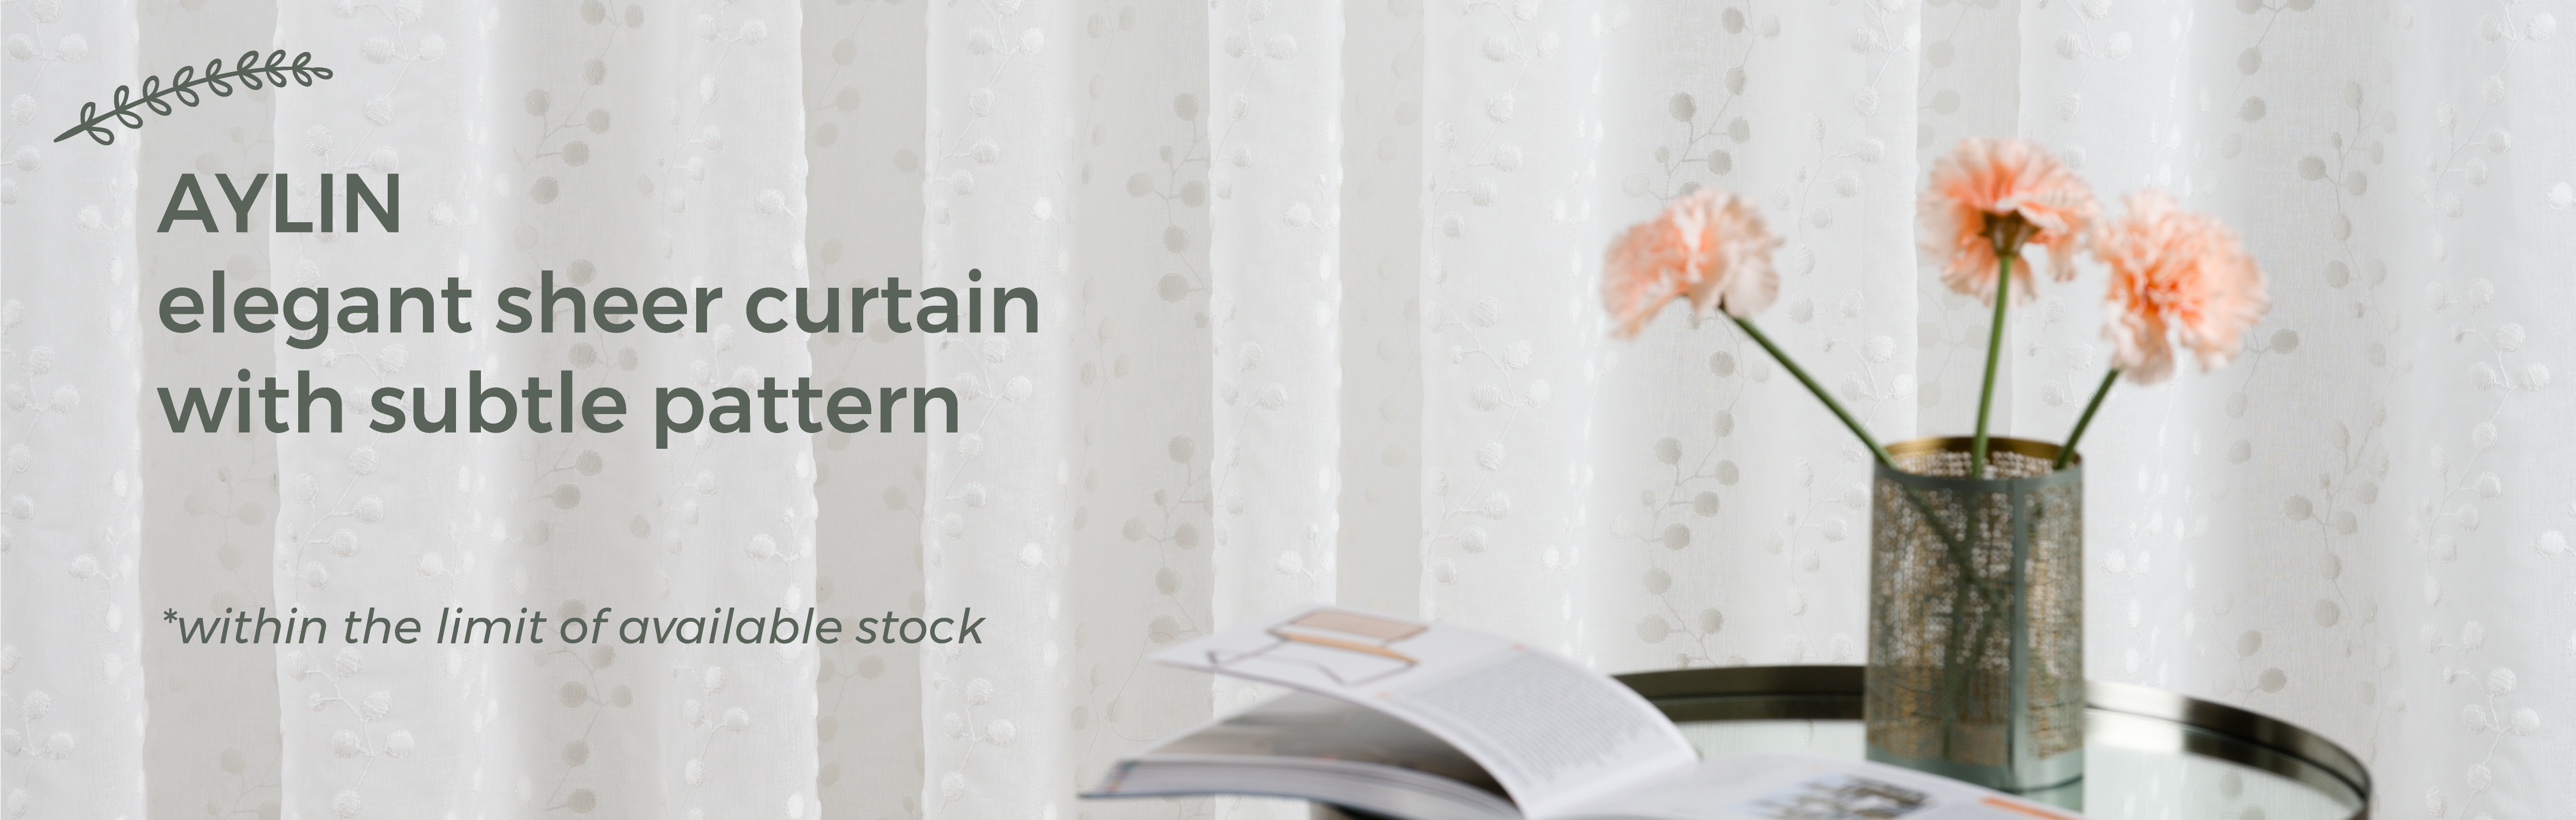 November's Promotion - Aylin Sheer Curtains